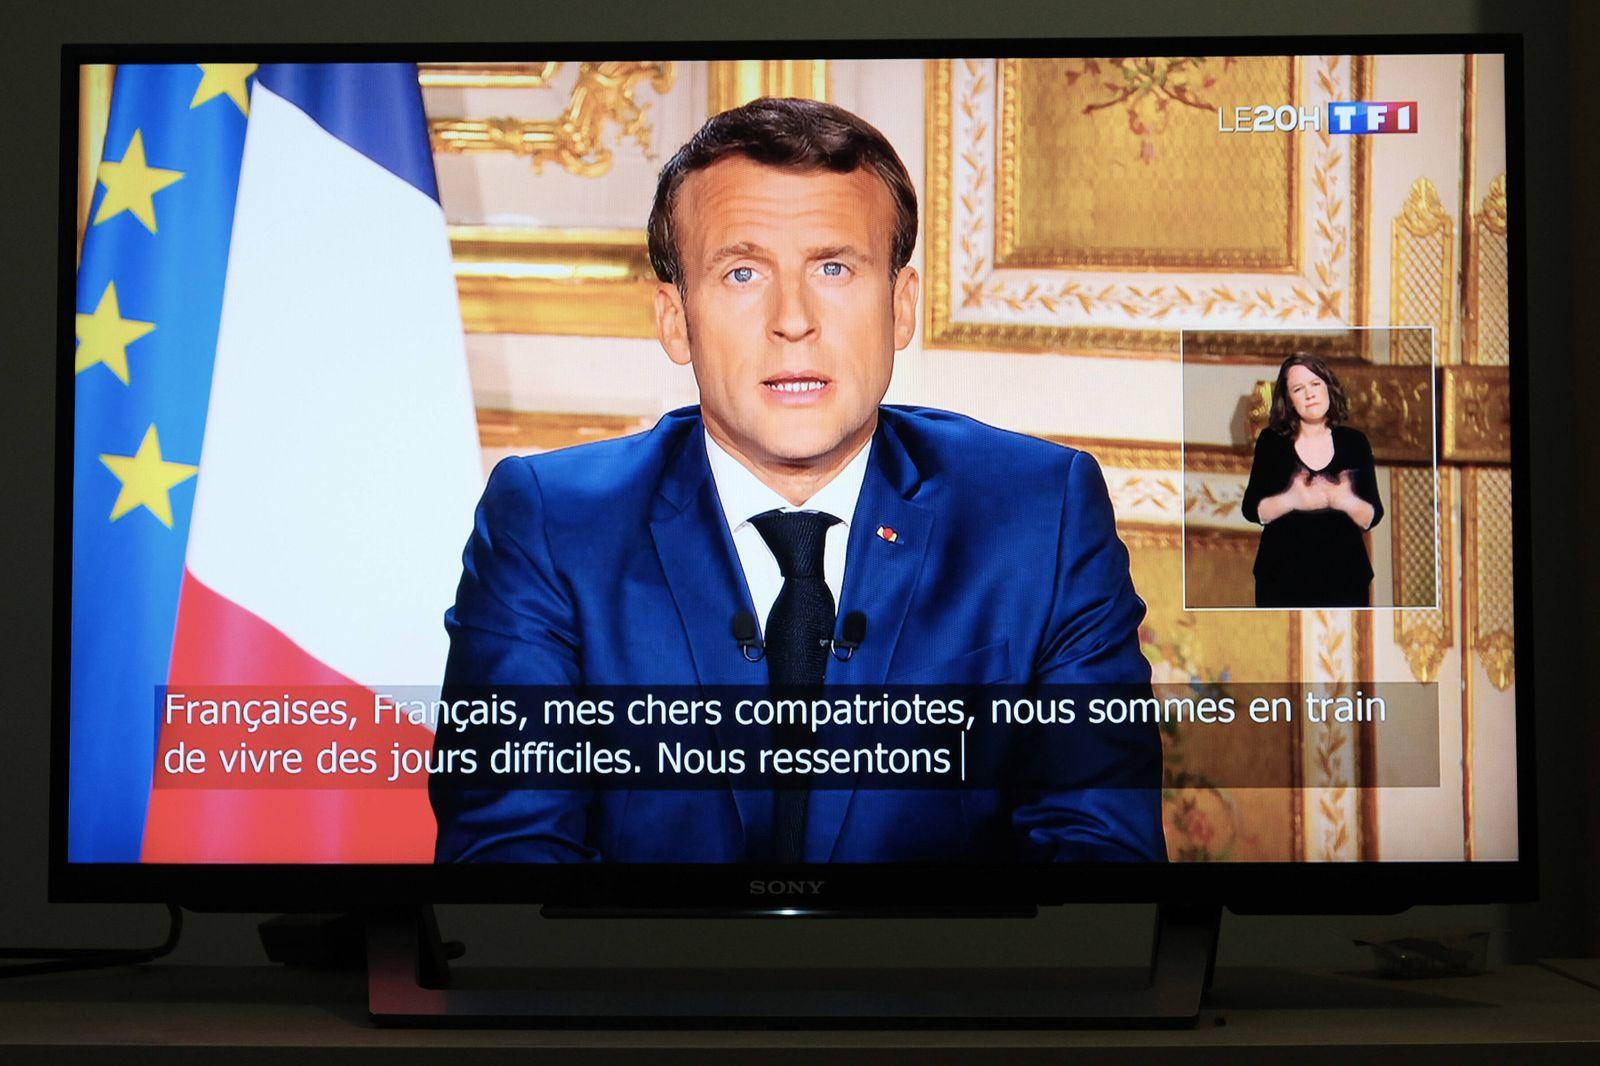 FRANCE - POLITICS - COVID 19 - EMMANUEL MACRON Intervention of the President of the French Republic, Emmanuel Macron, on